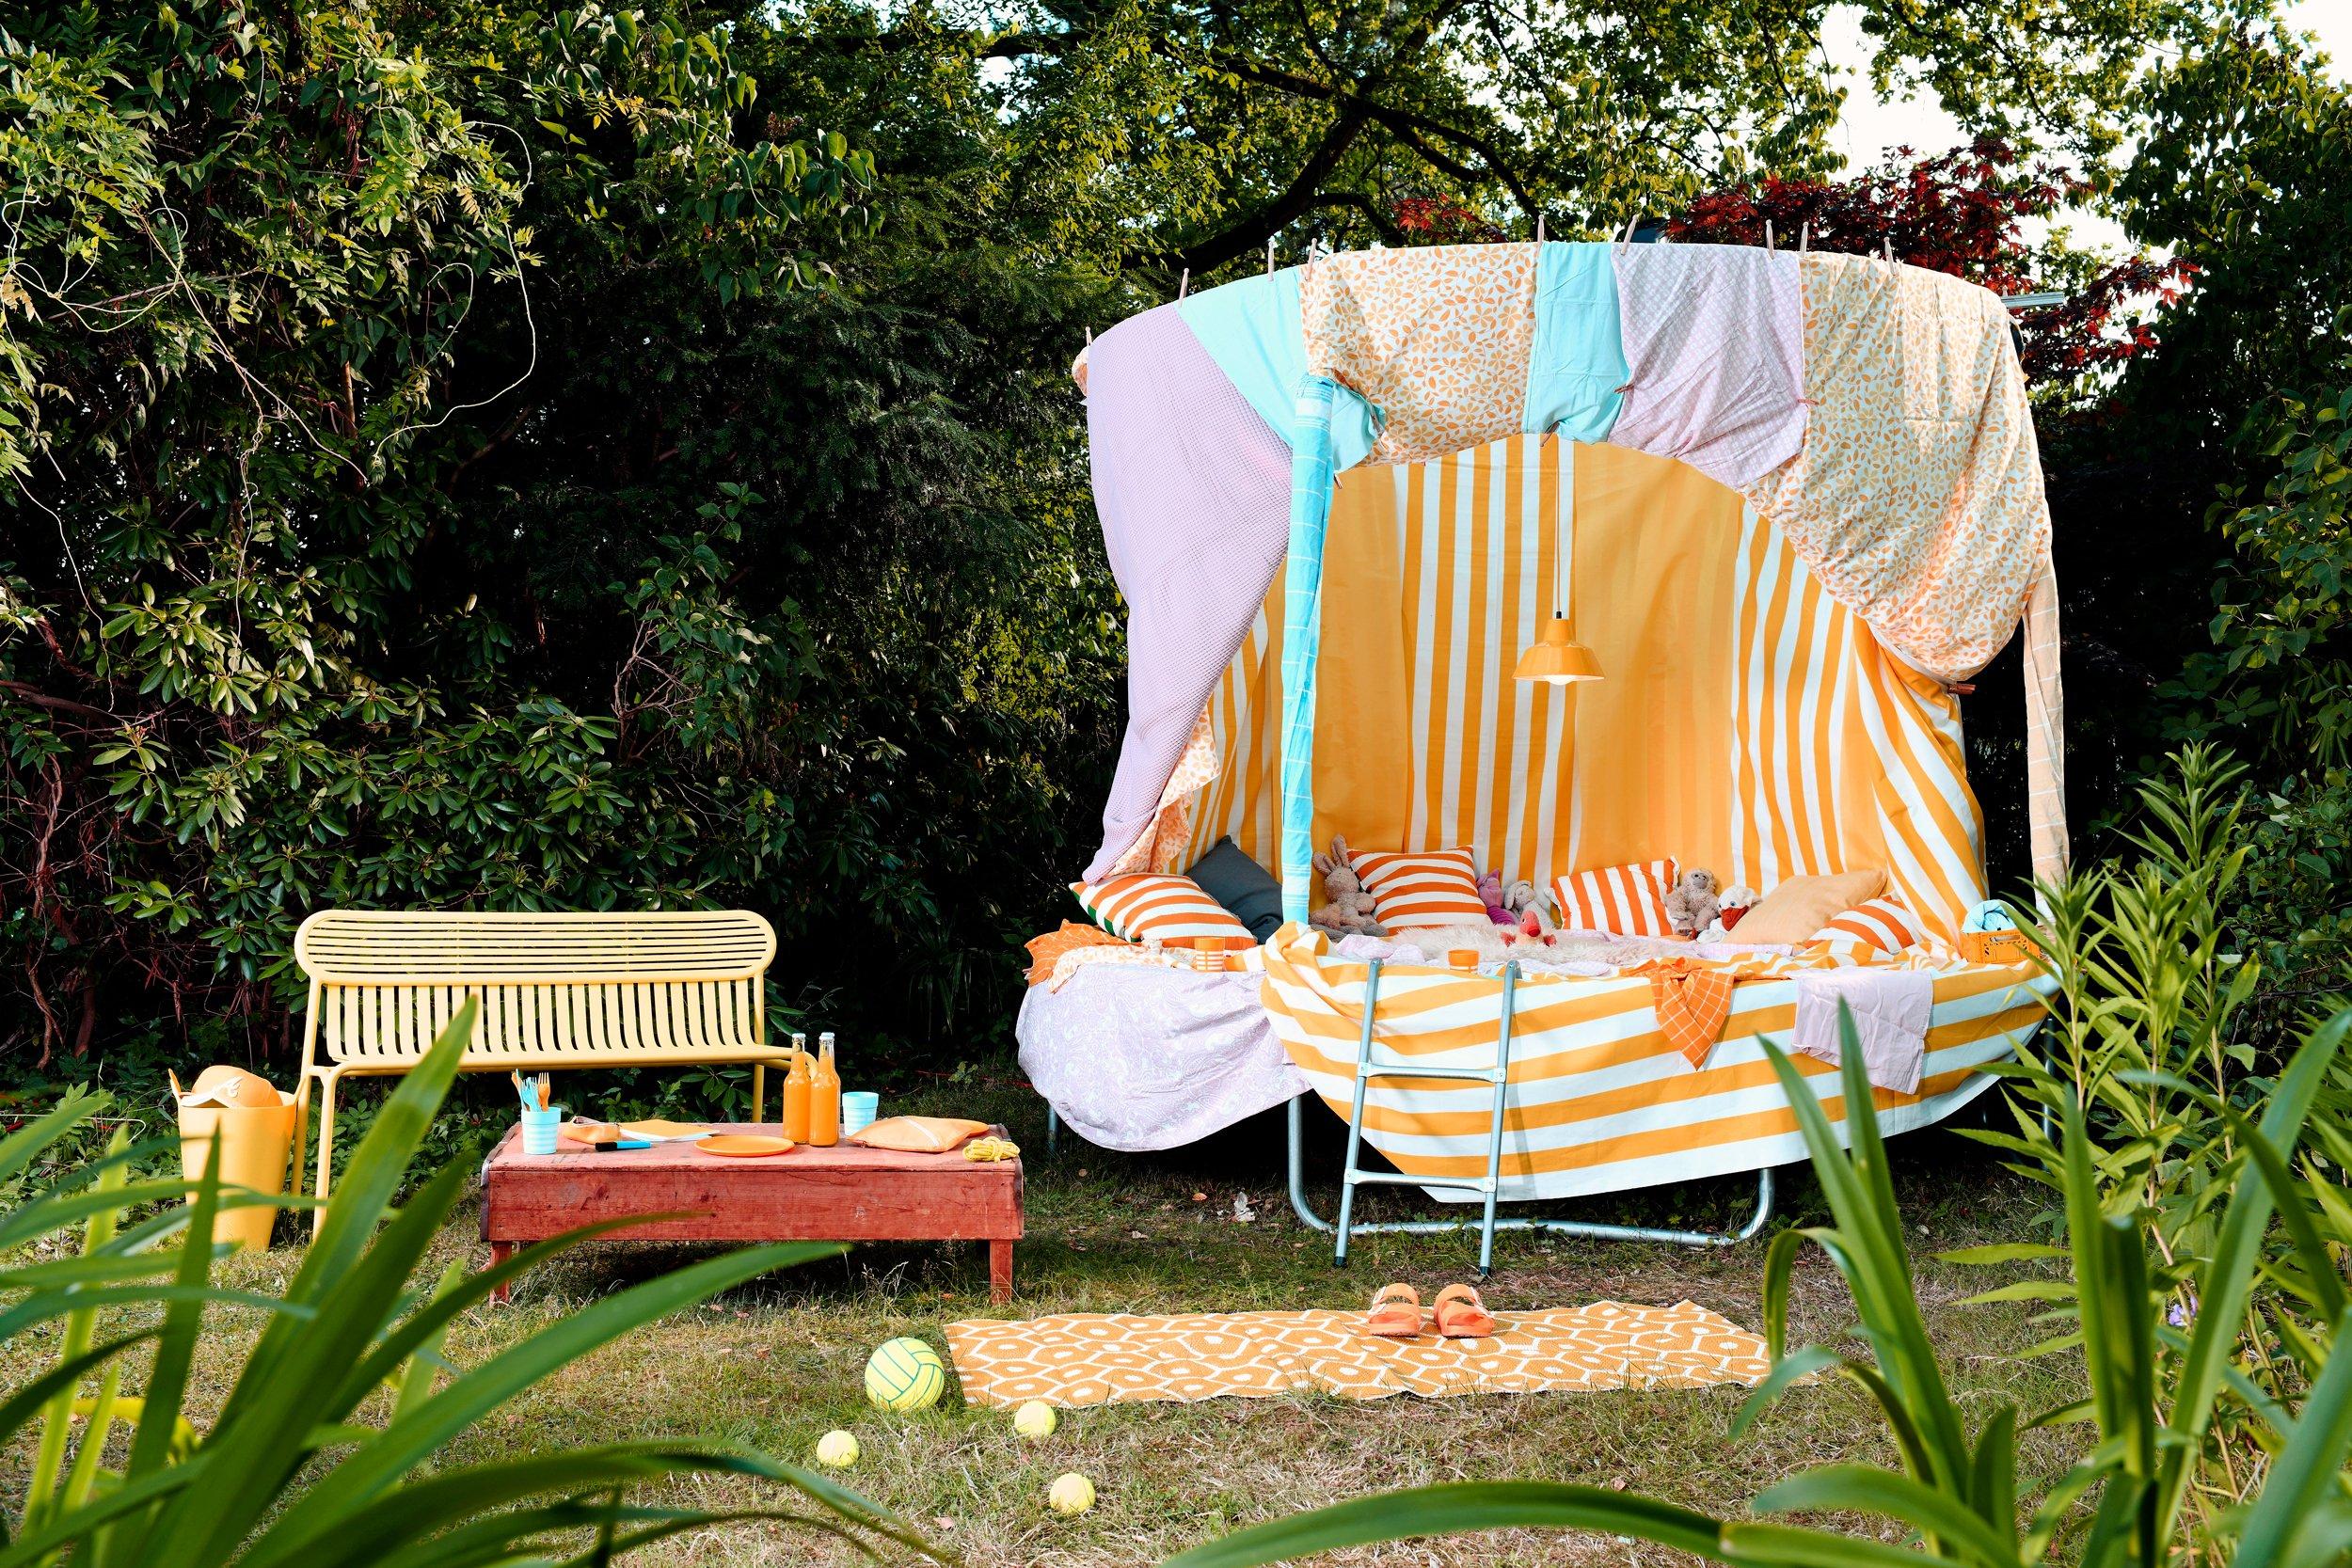 https://farconsulting.de/wp-content/uploads/2020/03/01_SummerStories_Story-1_Trampolin.jpg